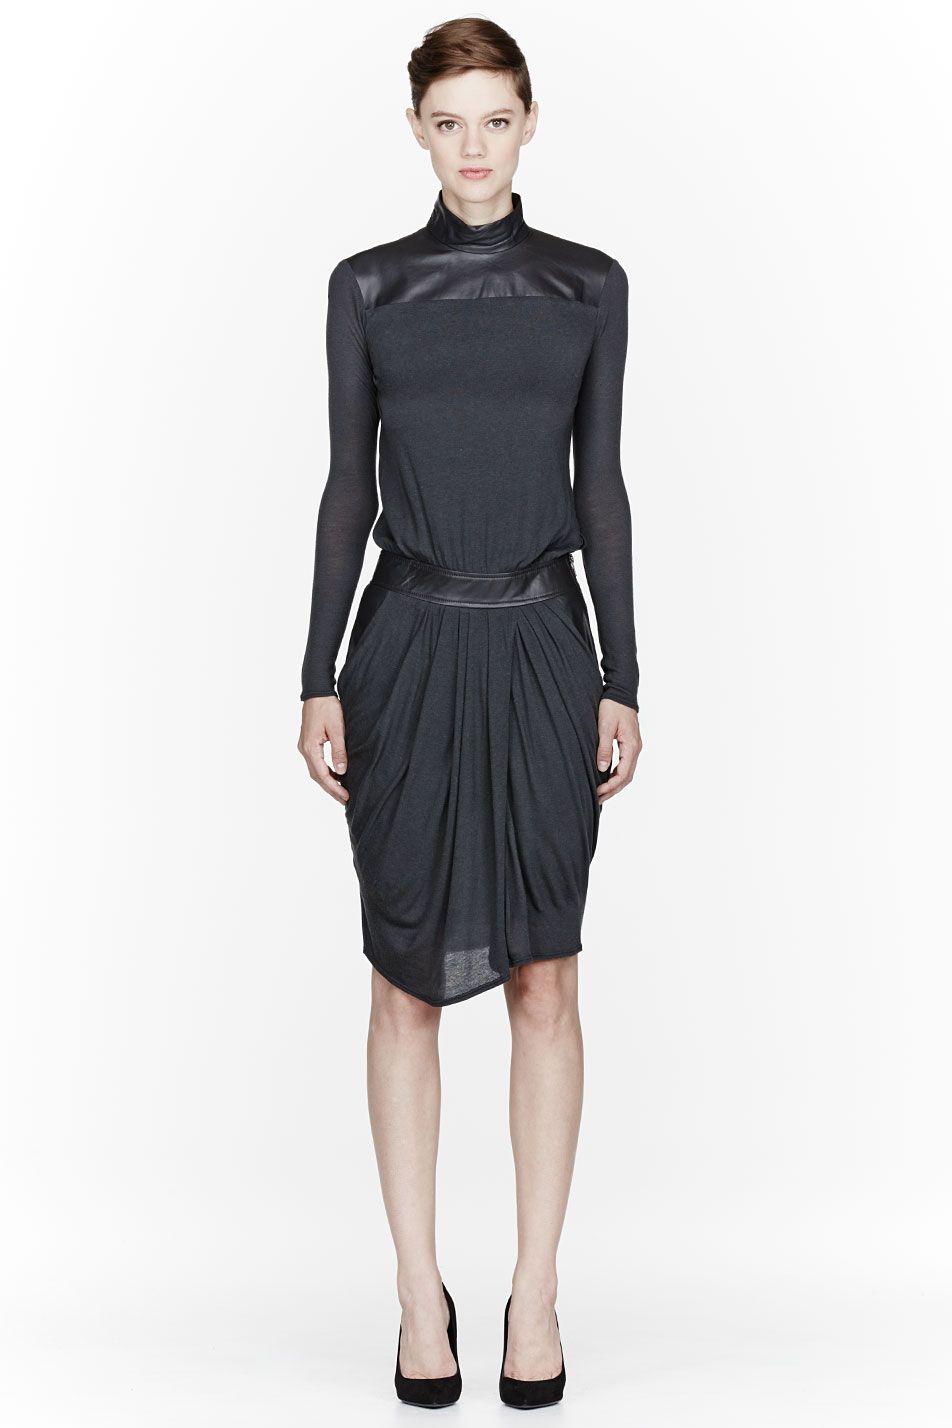 Helmut LANG | Charcoal Leather & Jersey Turtleneck Dress